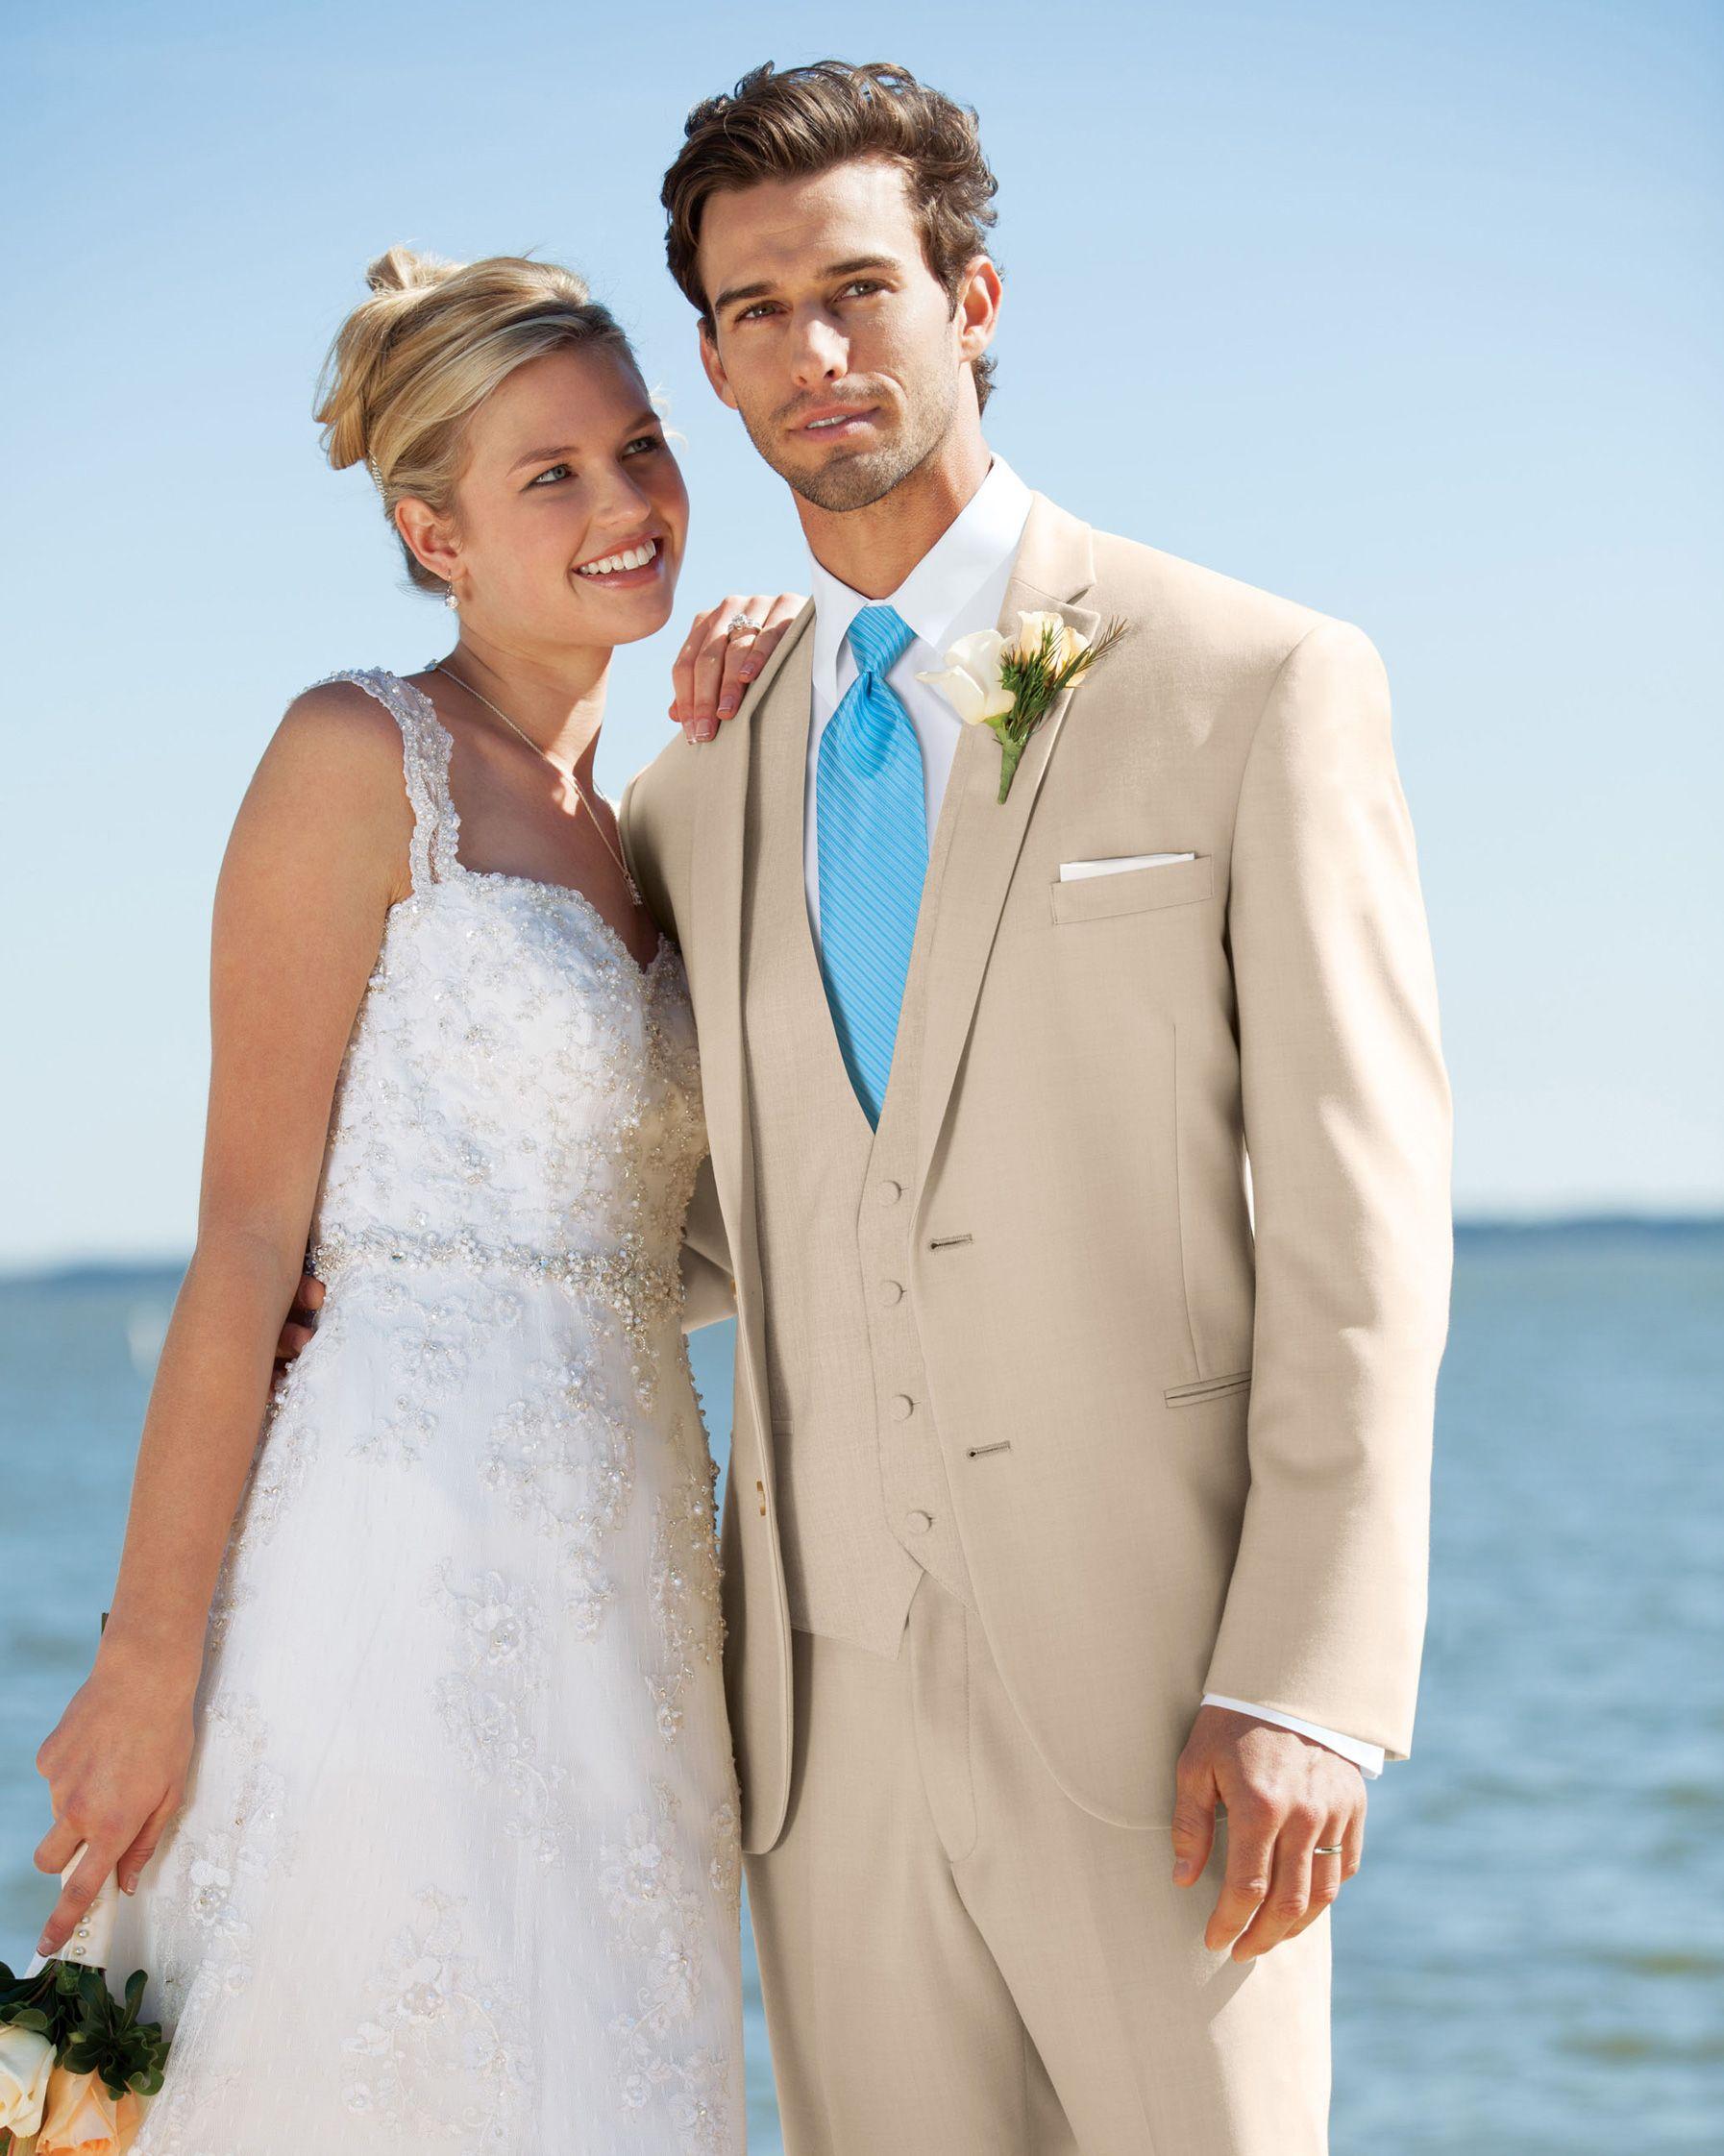 Tan Prom Tuxedo #tuxedo #khaki #bowtie #pink #prom #love #suit